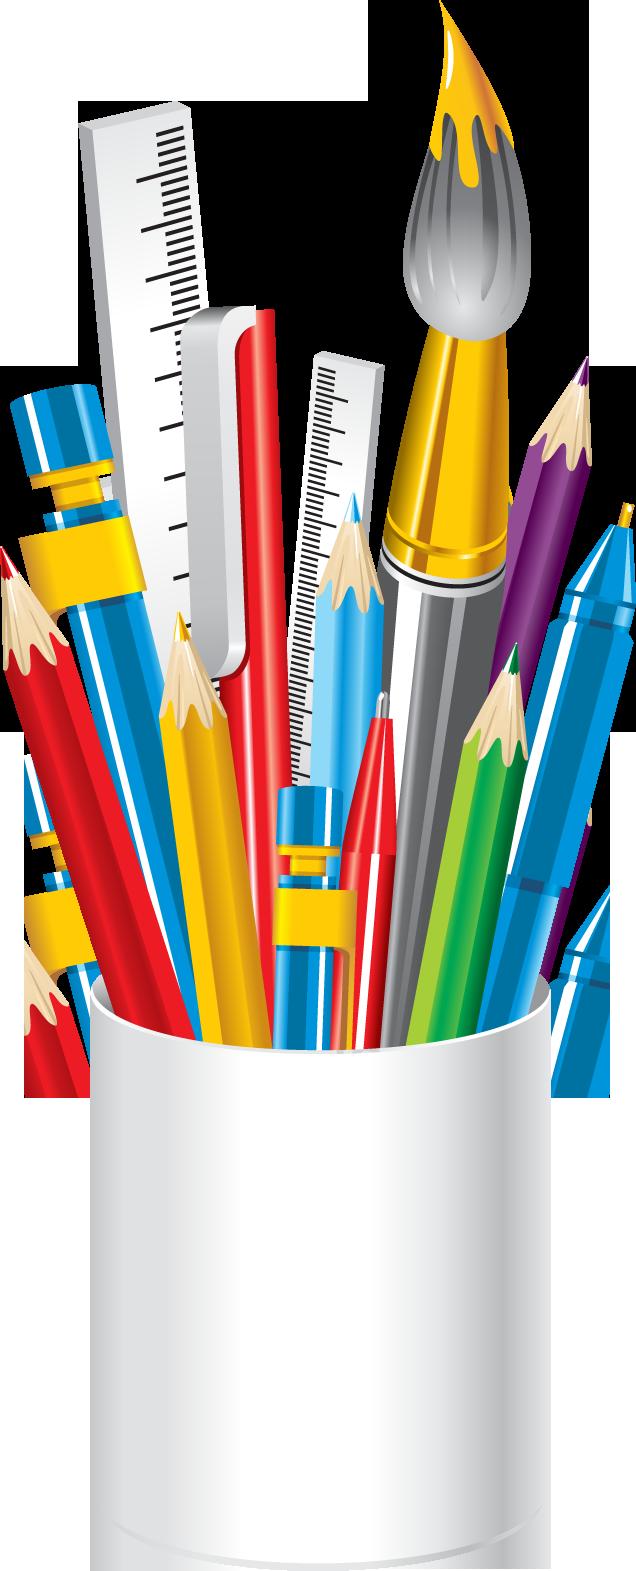 Crayon clipart art supply Clip supplies Before a ·